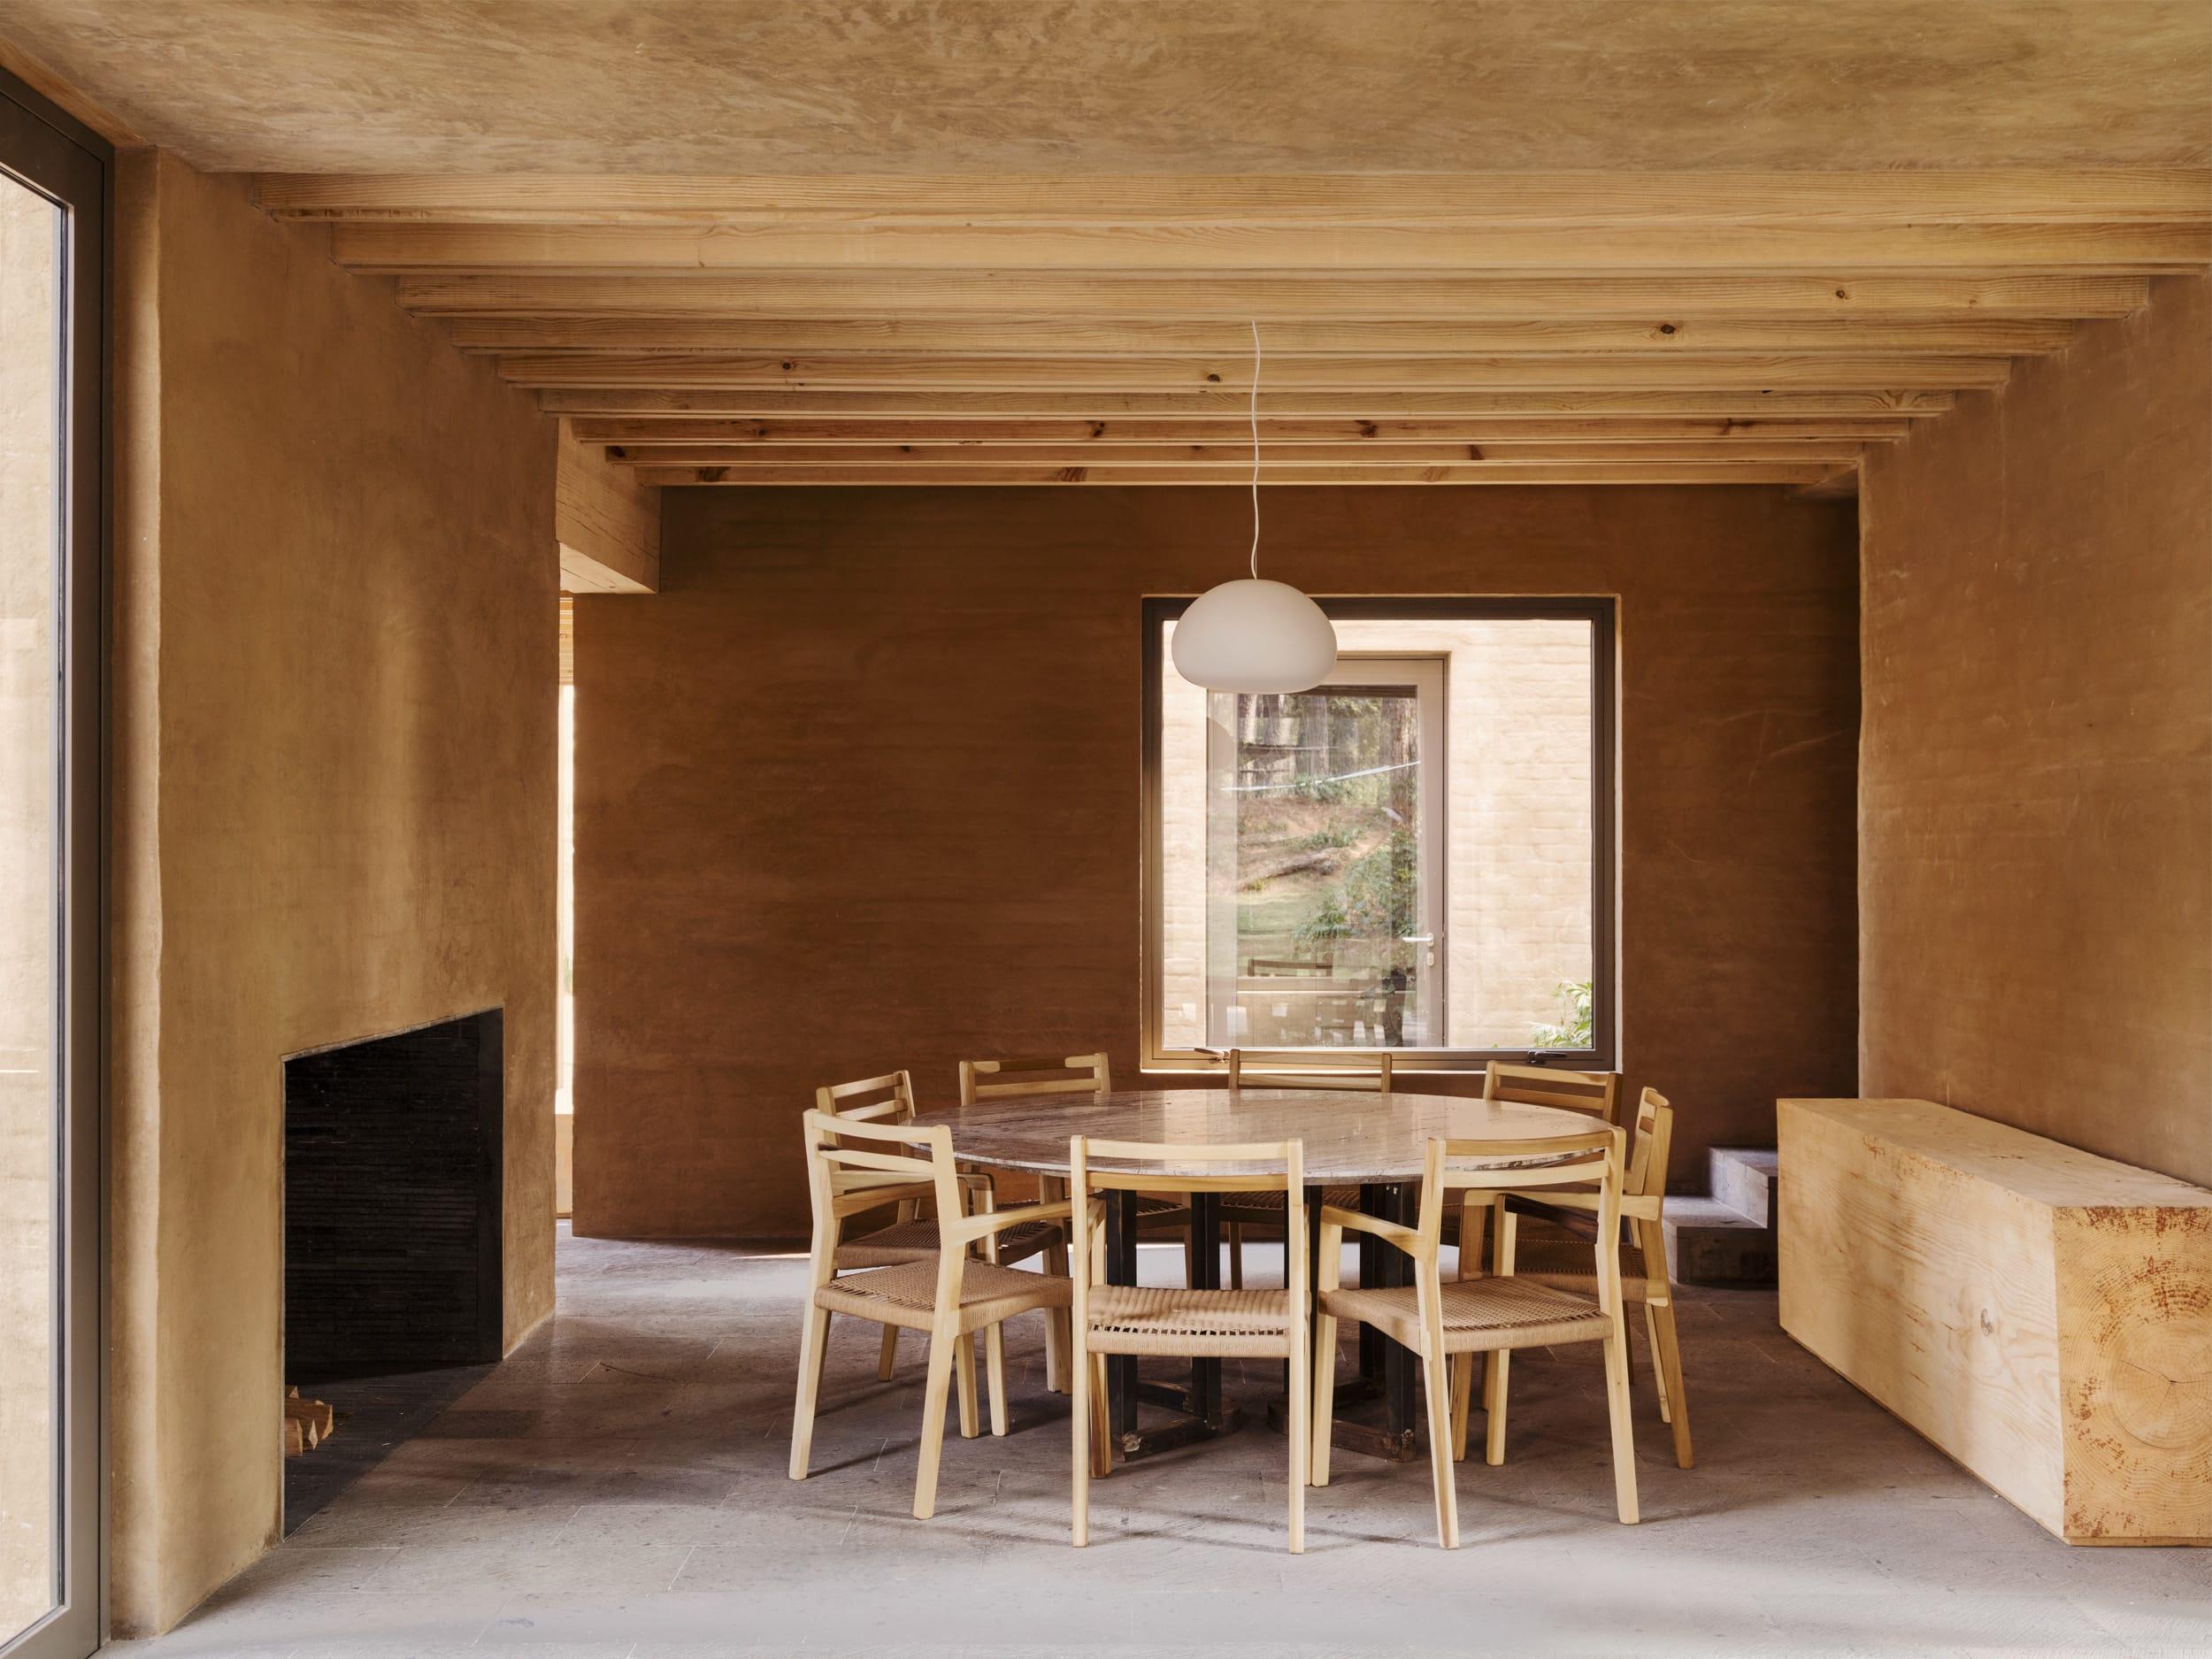 Strange Taller Hector Barroso Rory Gardiner Entre Pinos Divisare Machost Co Dining Chair Design Ideas Machostcouk